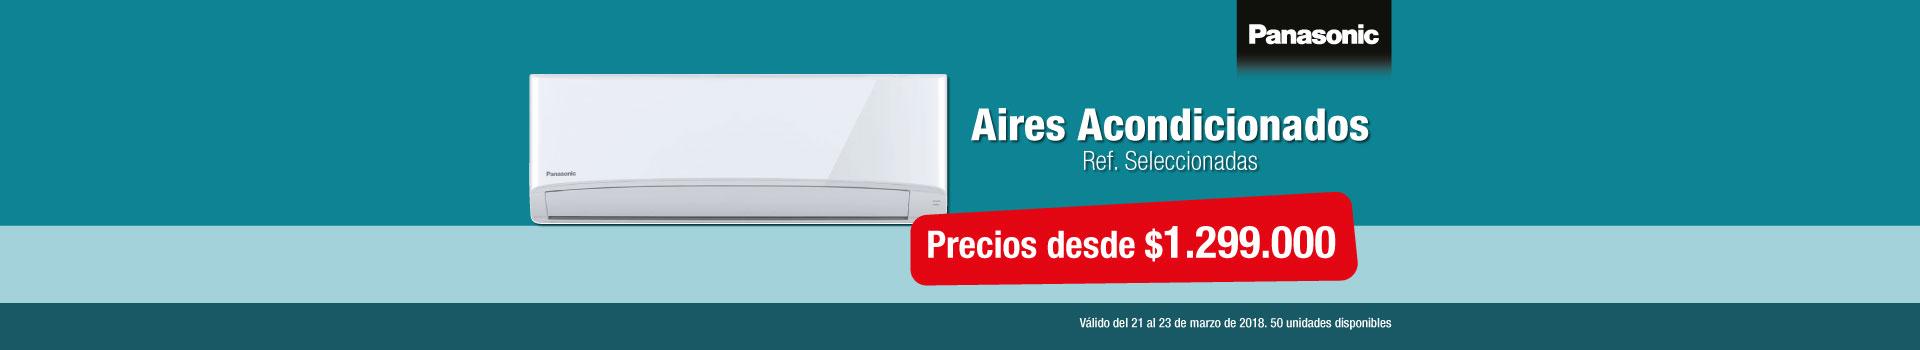 CAT-CLIMA-AKyKT-1-lb-AiresAcondicionadosPANASONIC-cat-marzo21-23